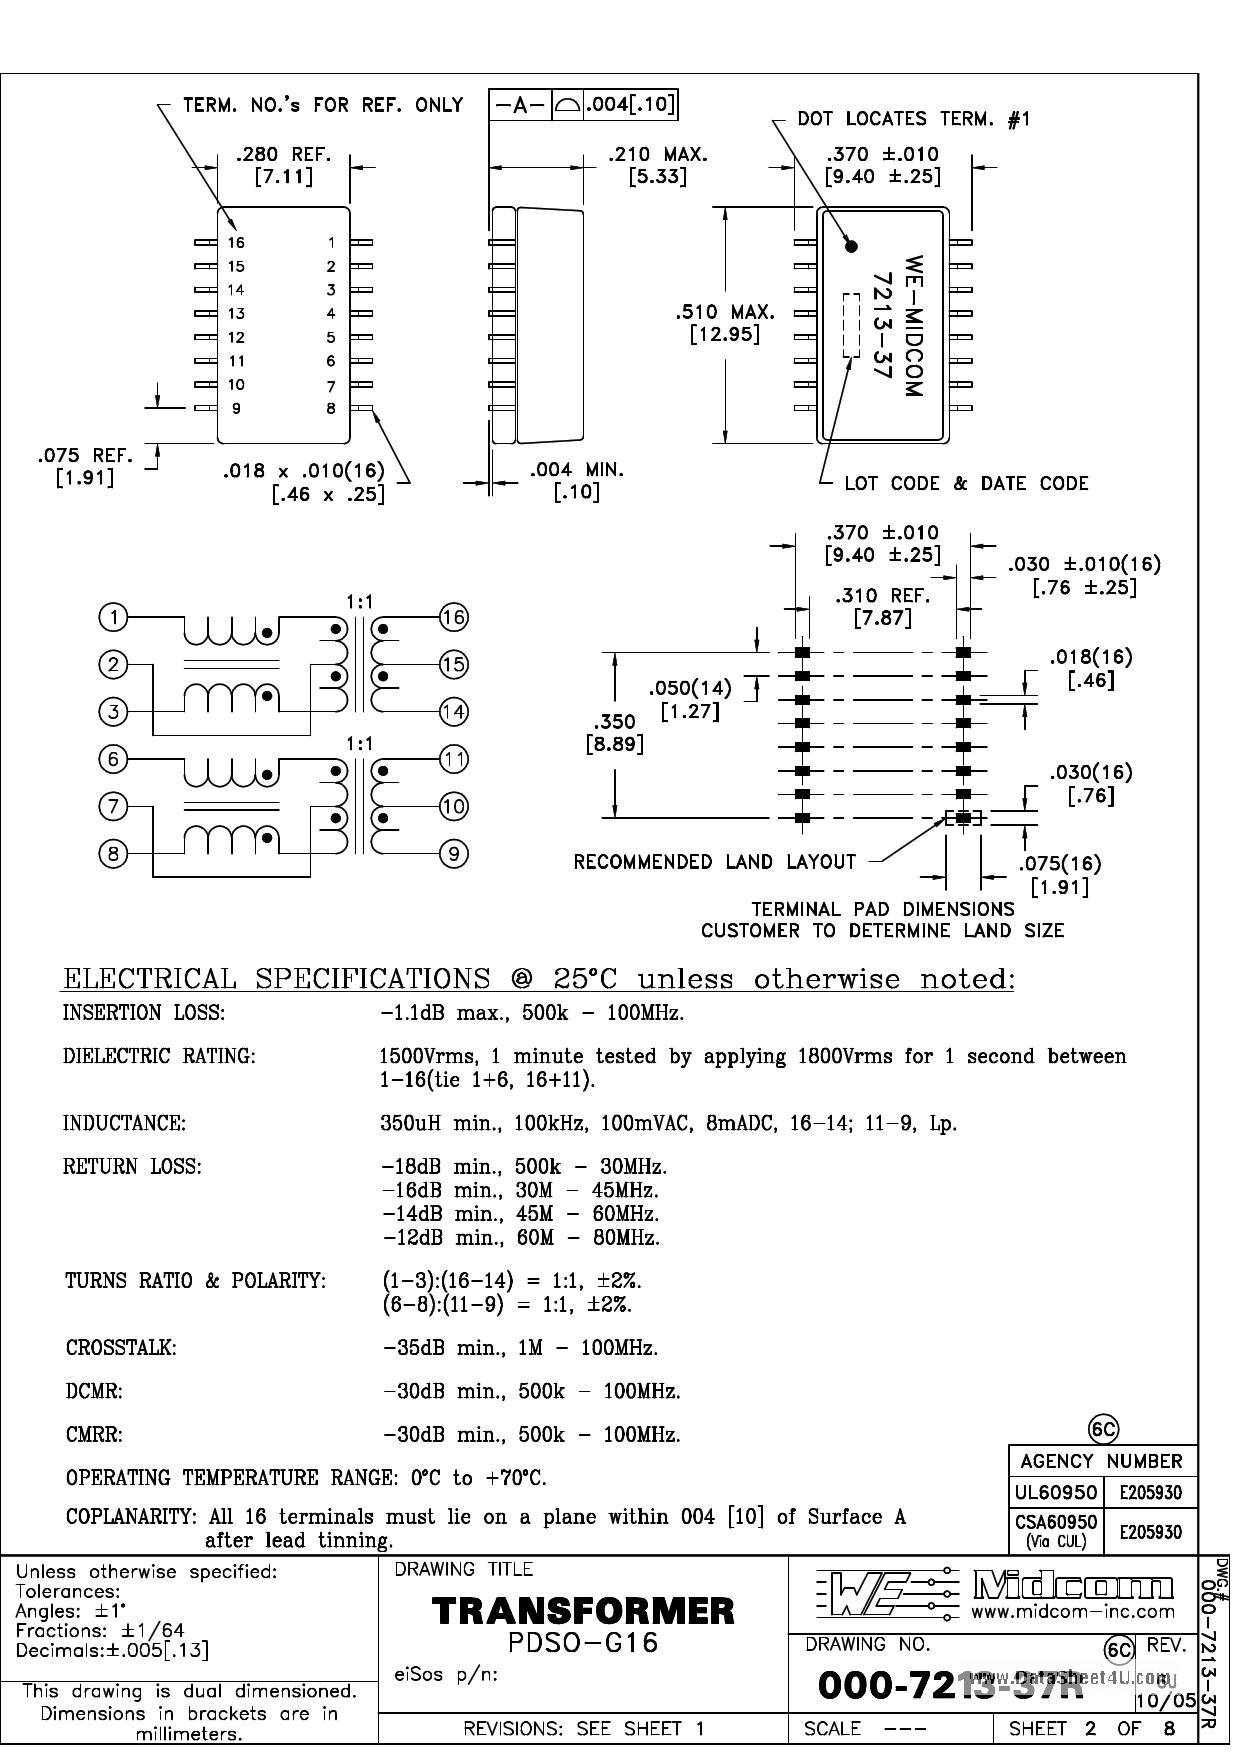 000-7213-37R datasheet